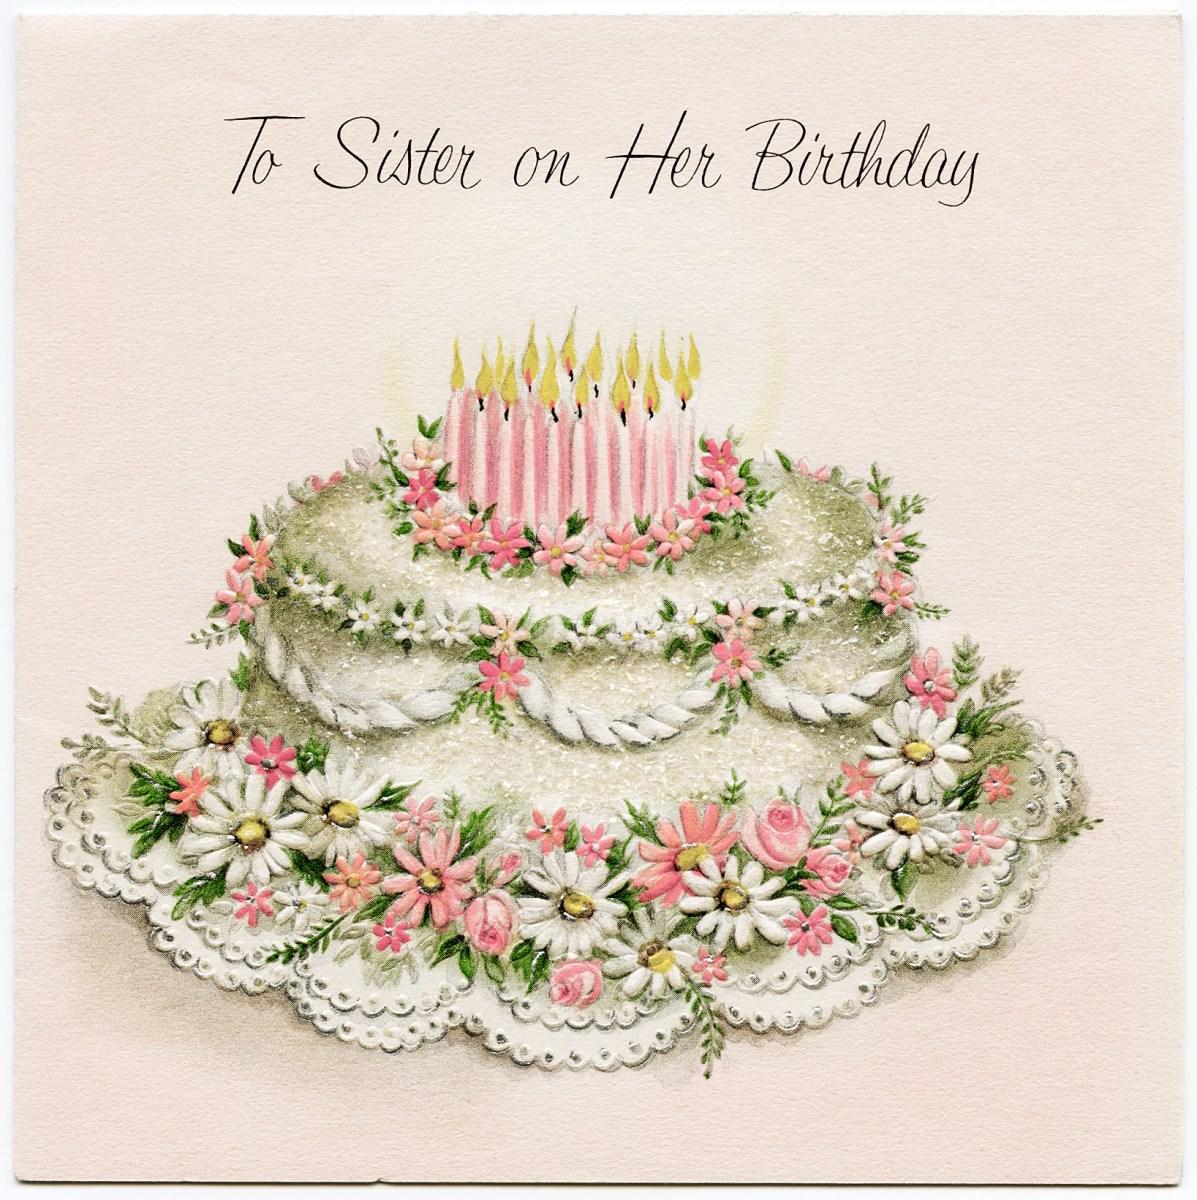 Birthday Love Greeting Cards: Vintage Sister Birthday Greeting Card